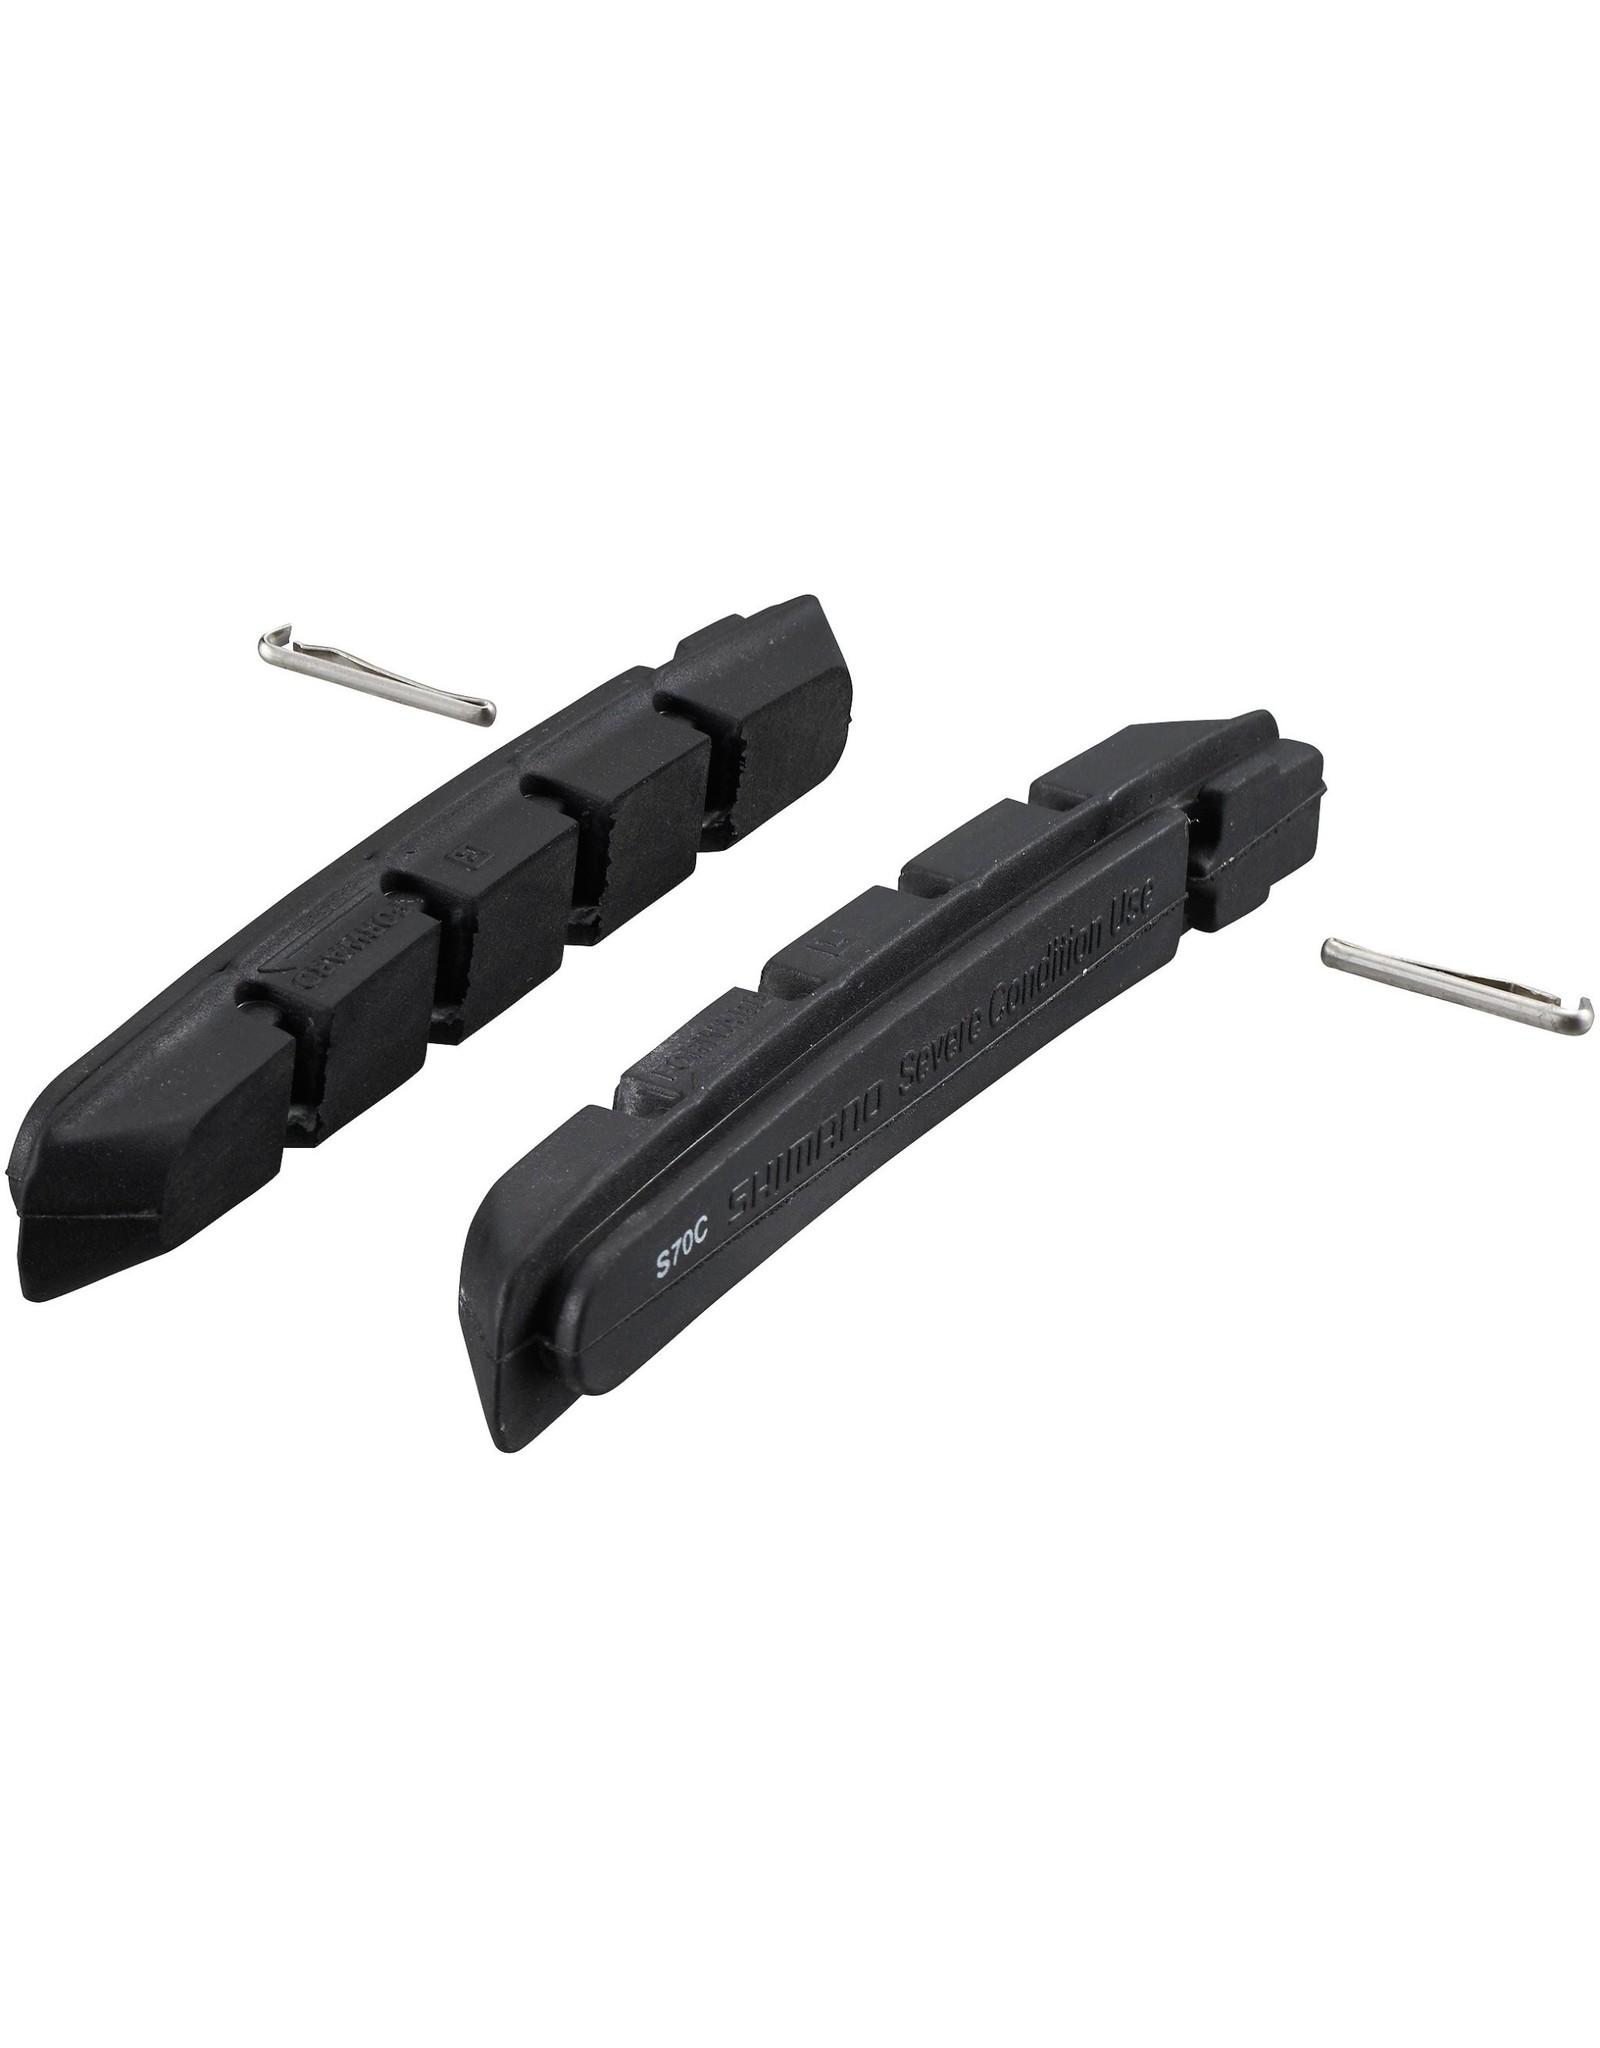 Shimano S70C replacement cartridge pads